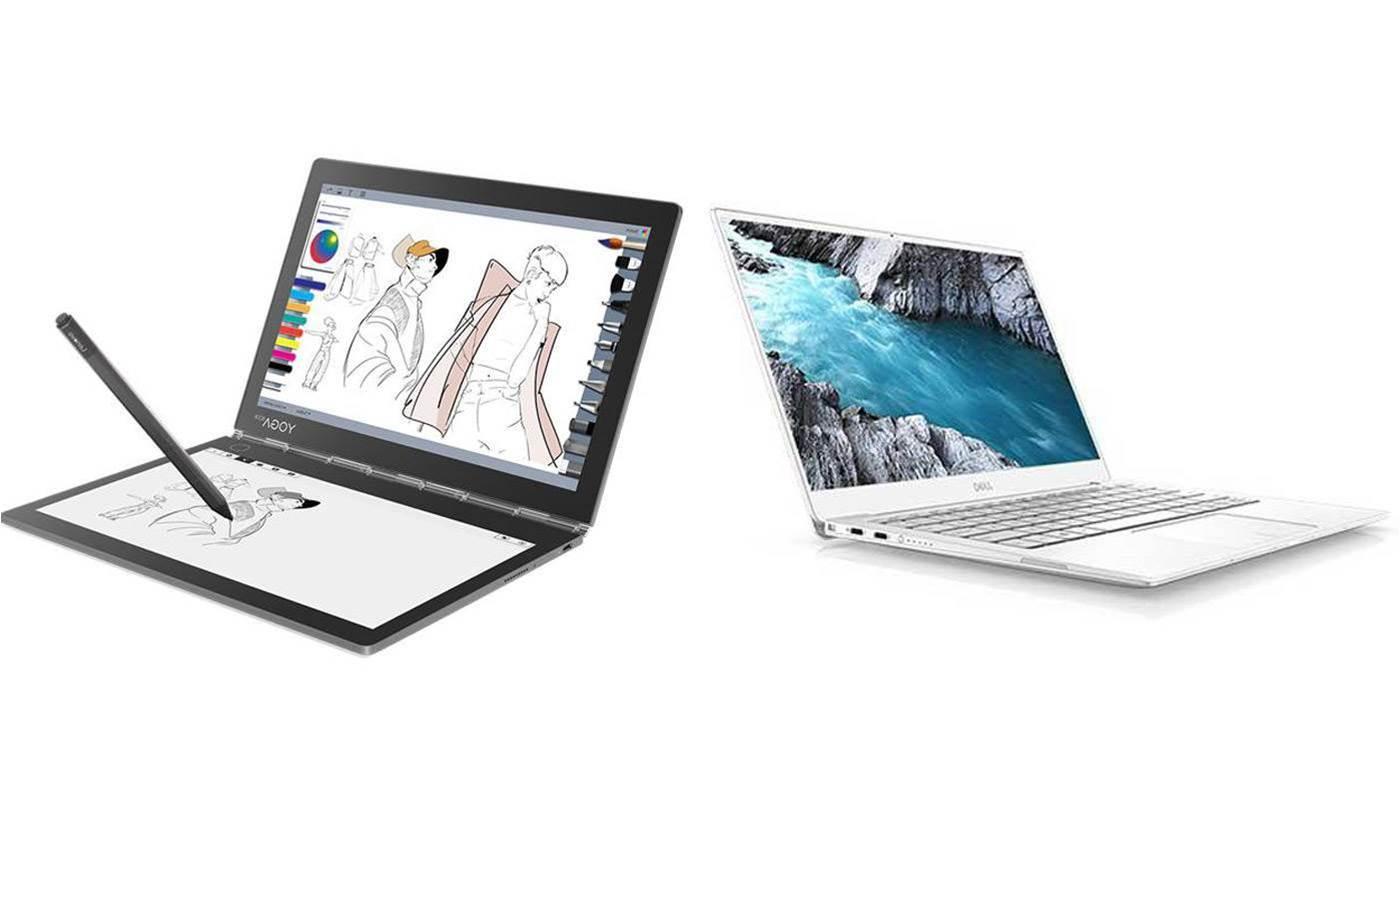 Head-to-head: Dell XPS 13 VS Lenovo Yoga C930